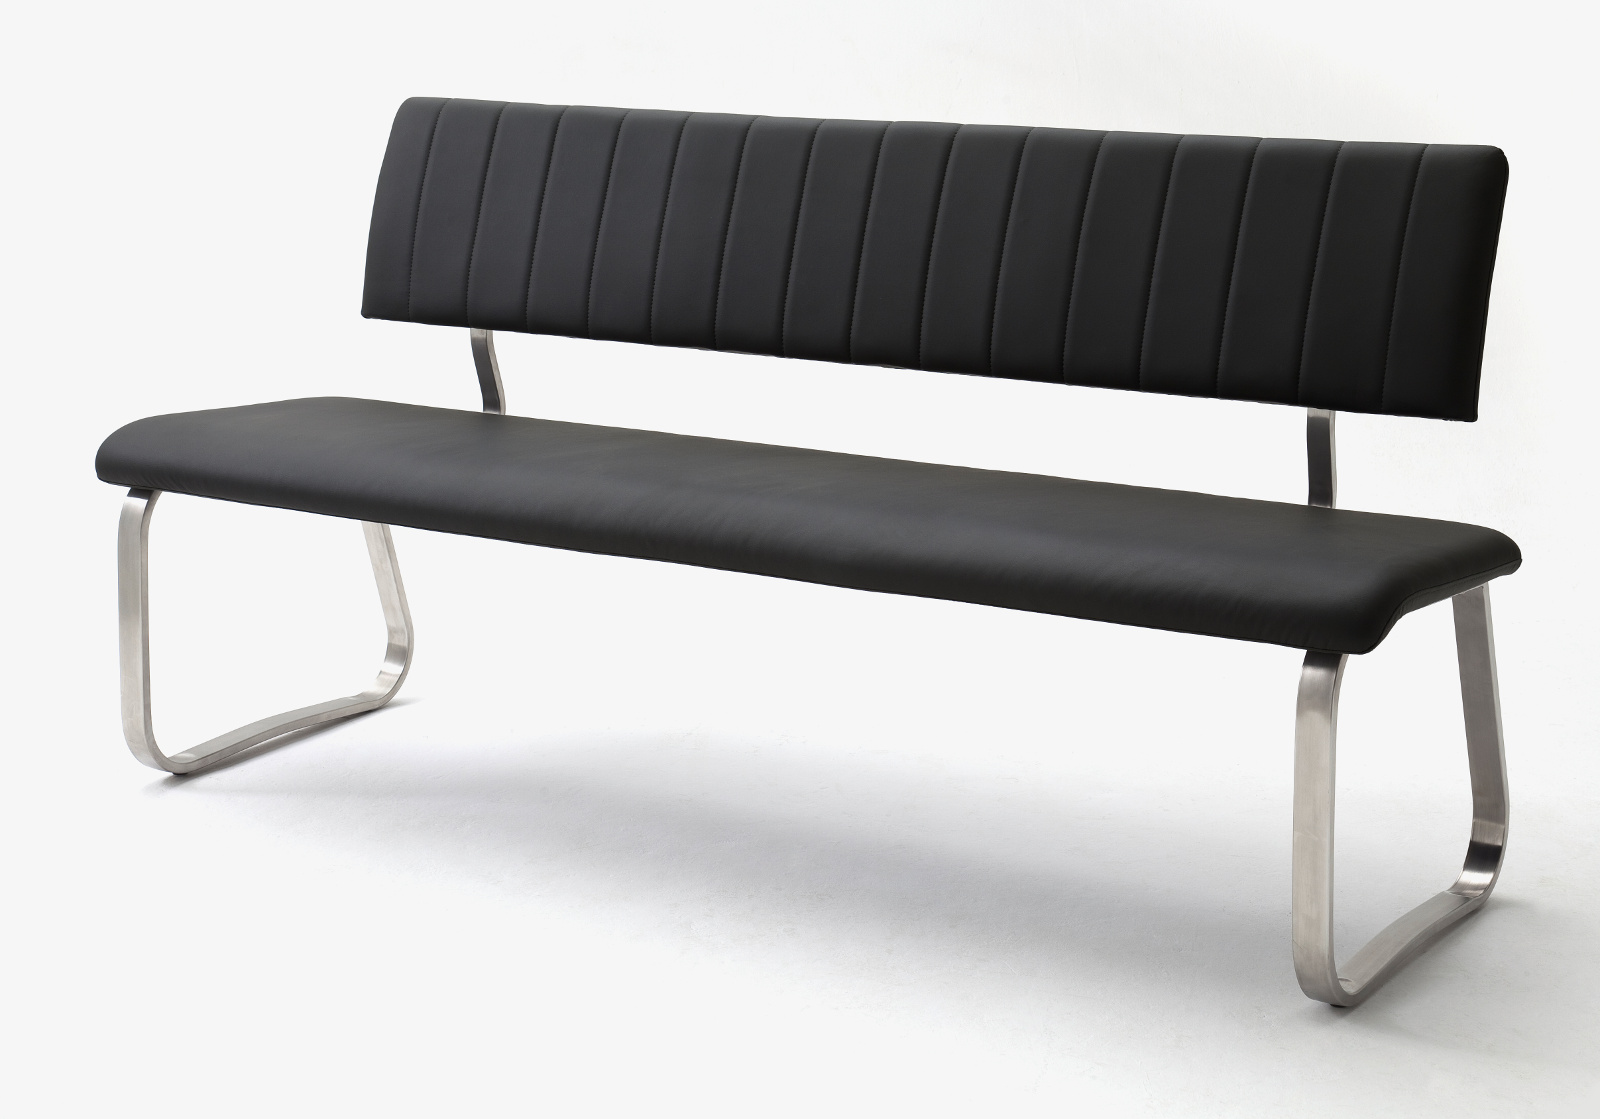 wohnwand schrankwand kernbuche massiv ge lt medara1. Black Bedroom Furniture Sets. Home Design Ideas